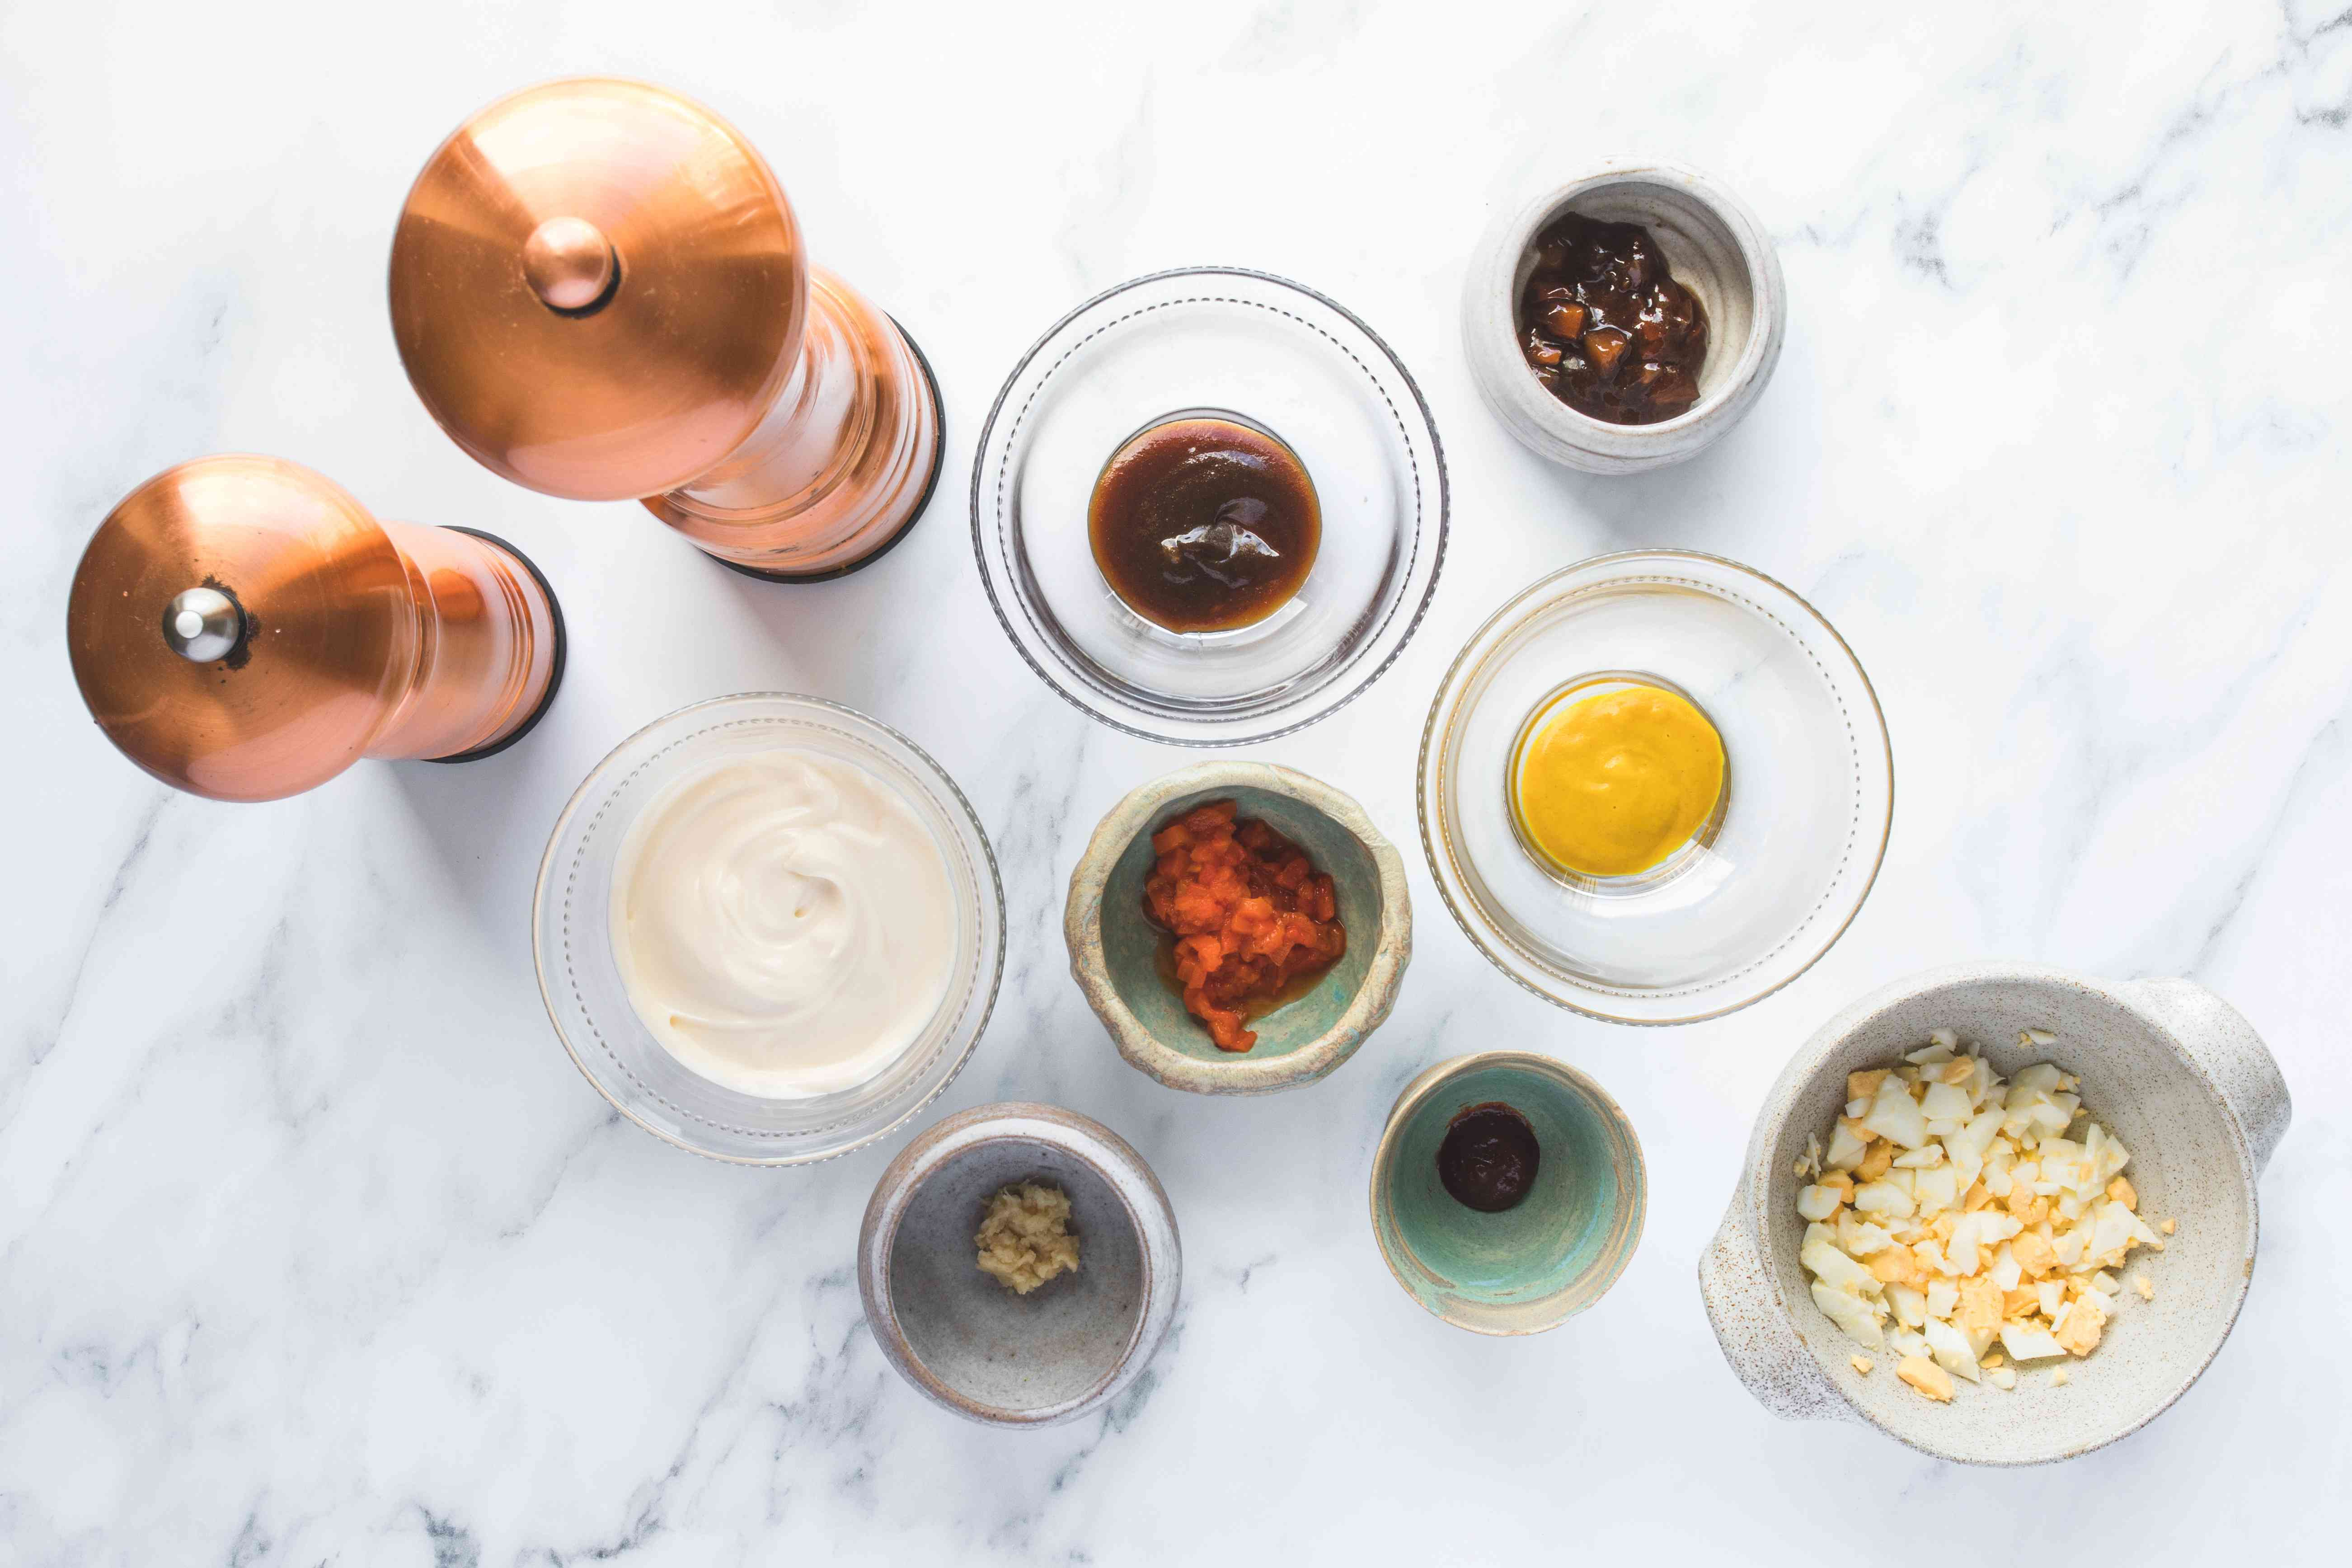 Ingredients for turkey reuben dressing